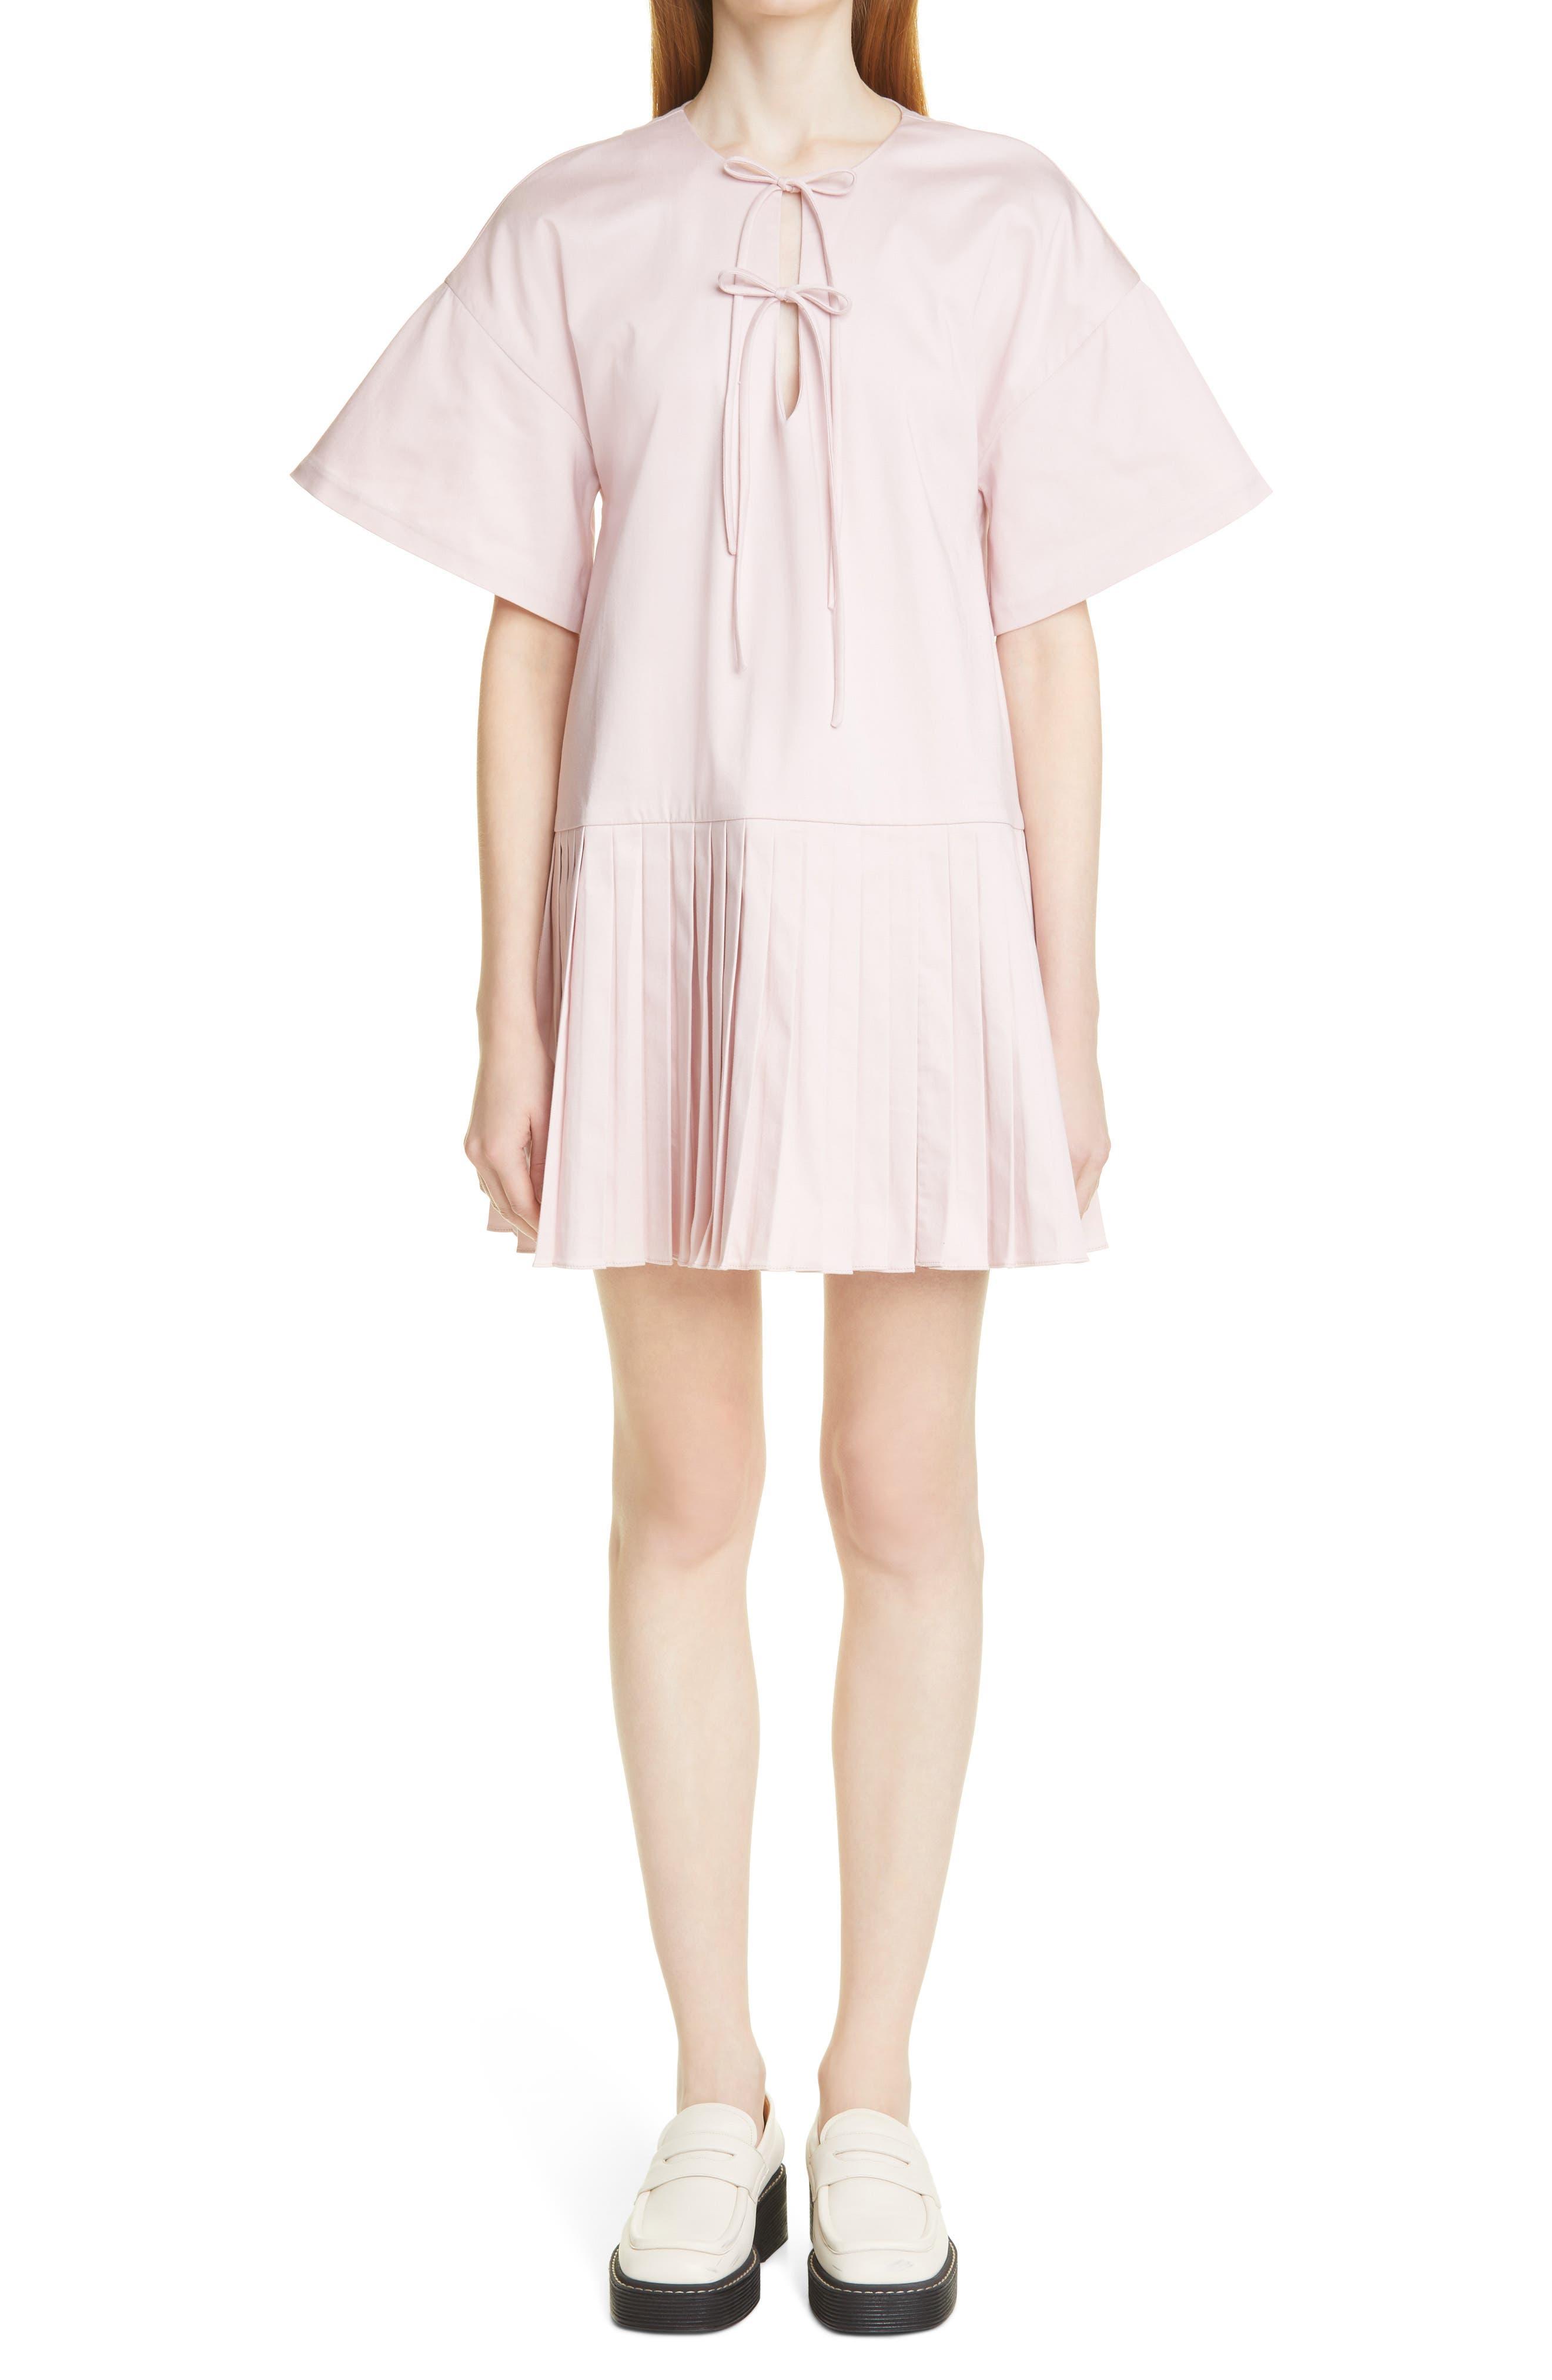 Anne Pleated Drop Waist Minidress